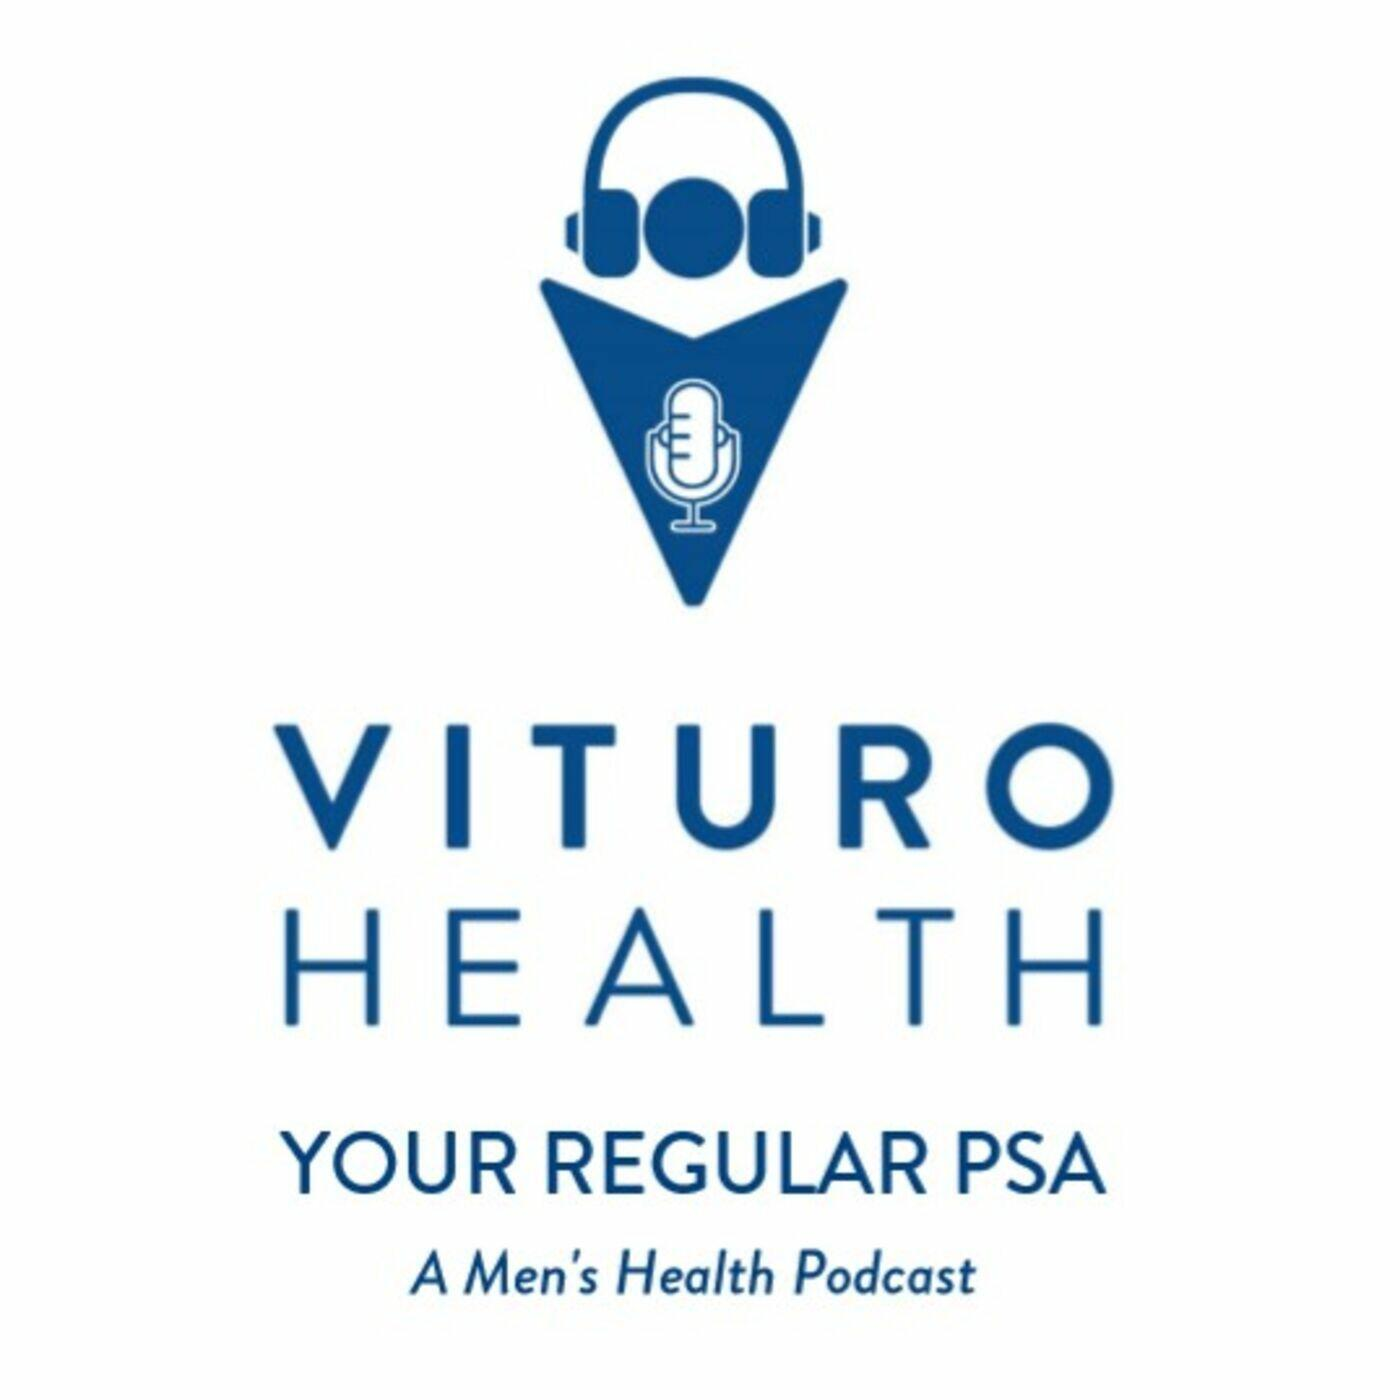 Vituro Health: Your Regular PSA